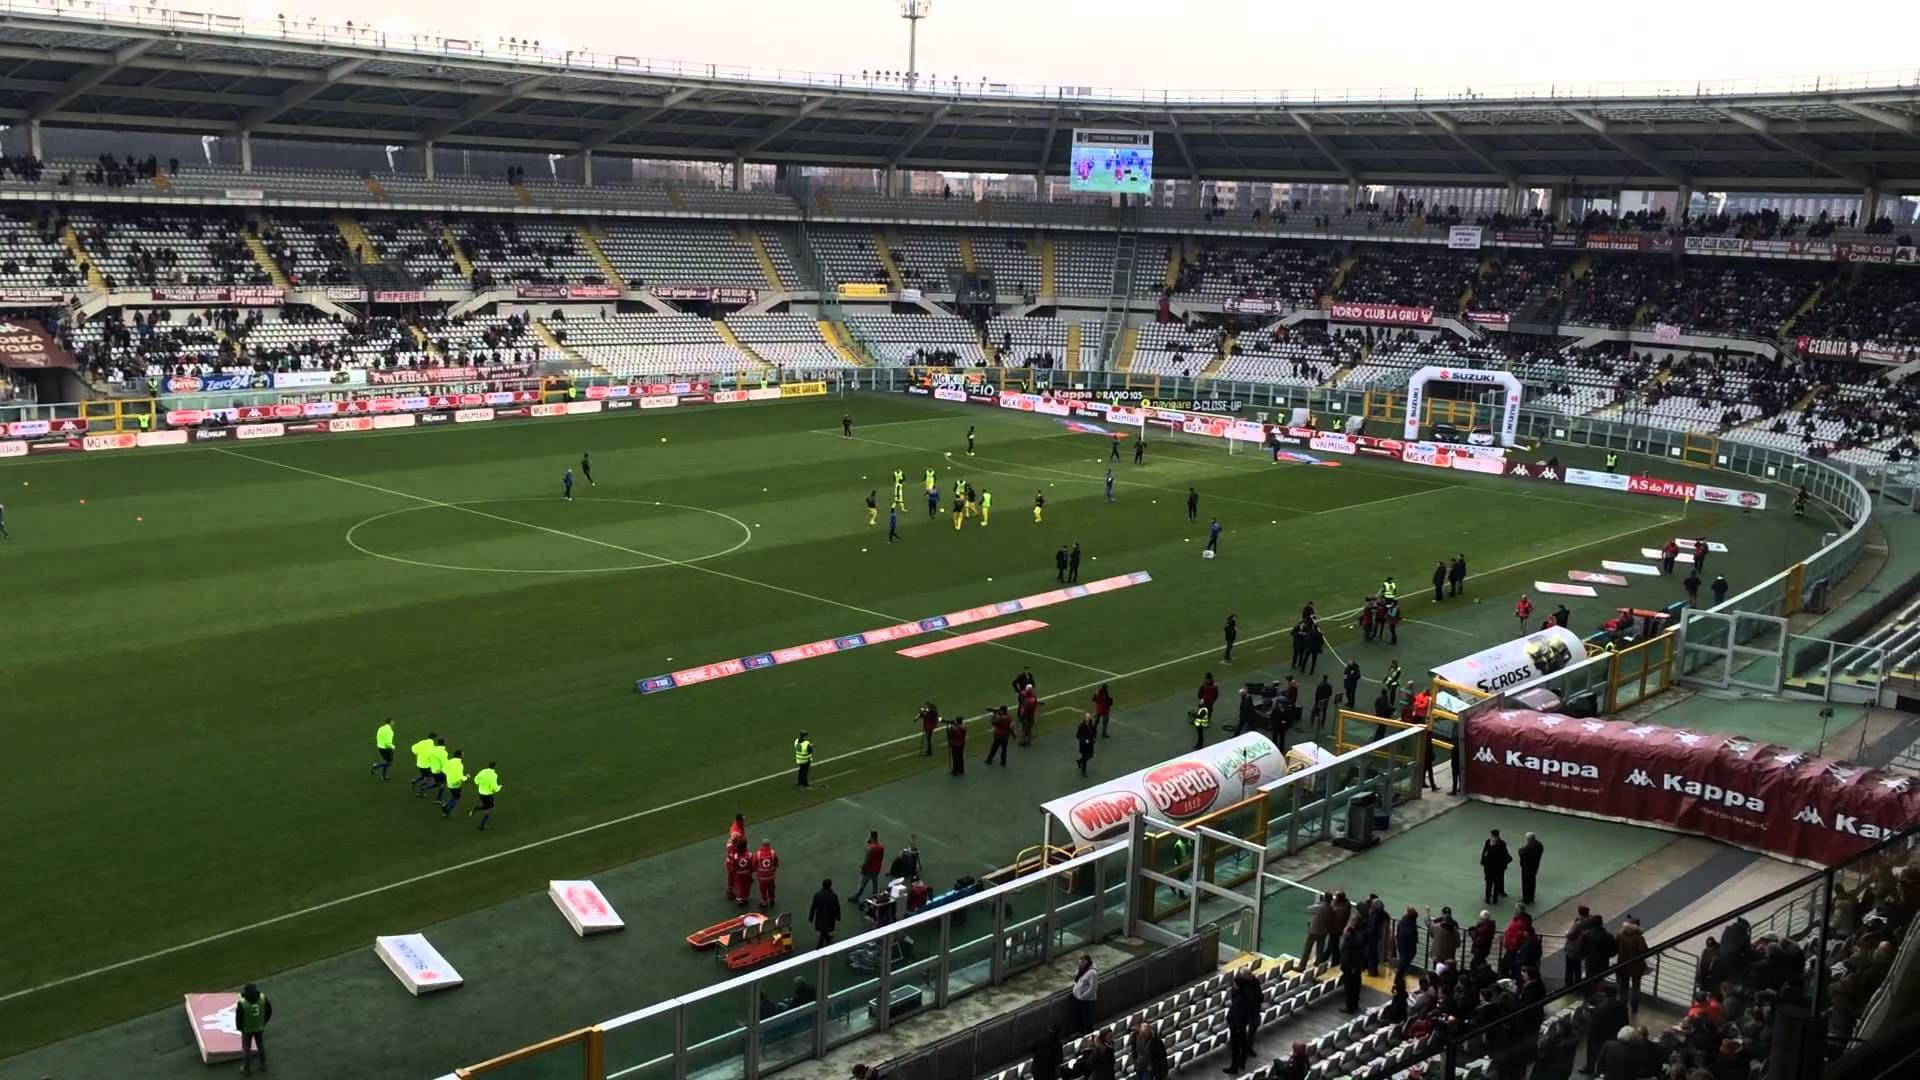 VISITato per Voi! Stadio Grande Torino